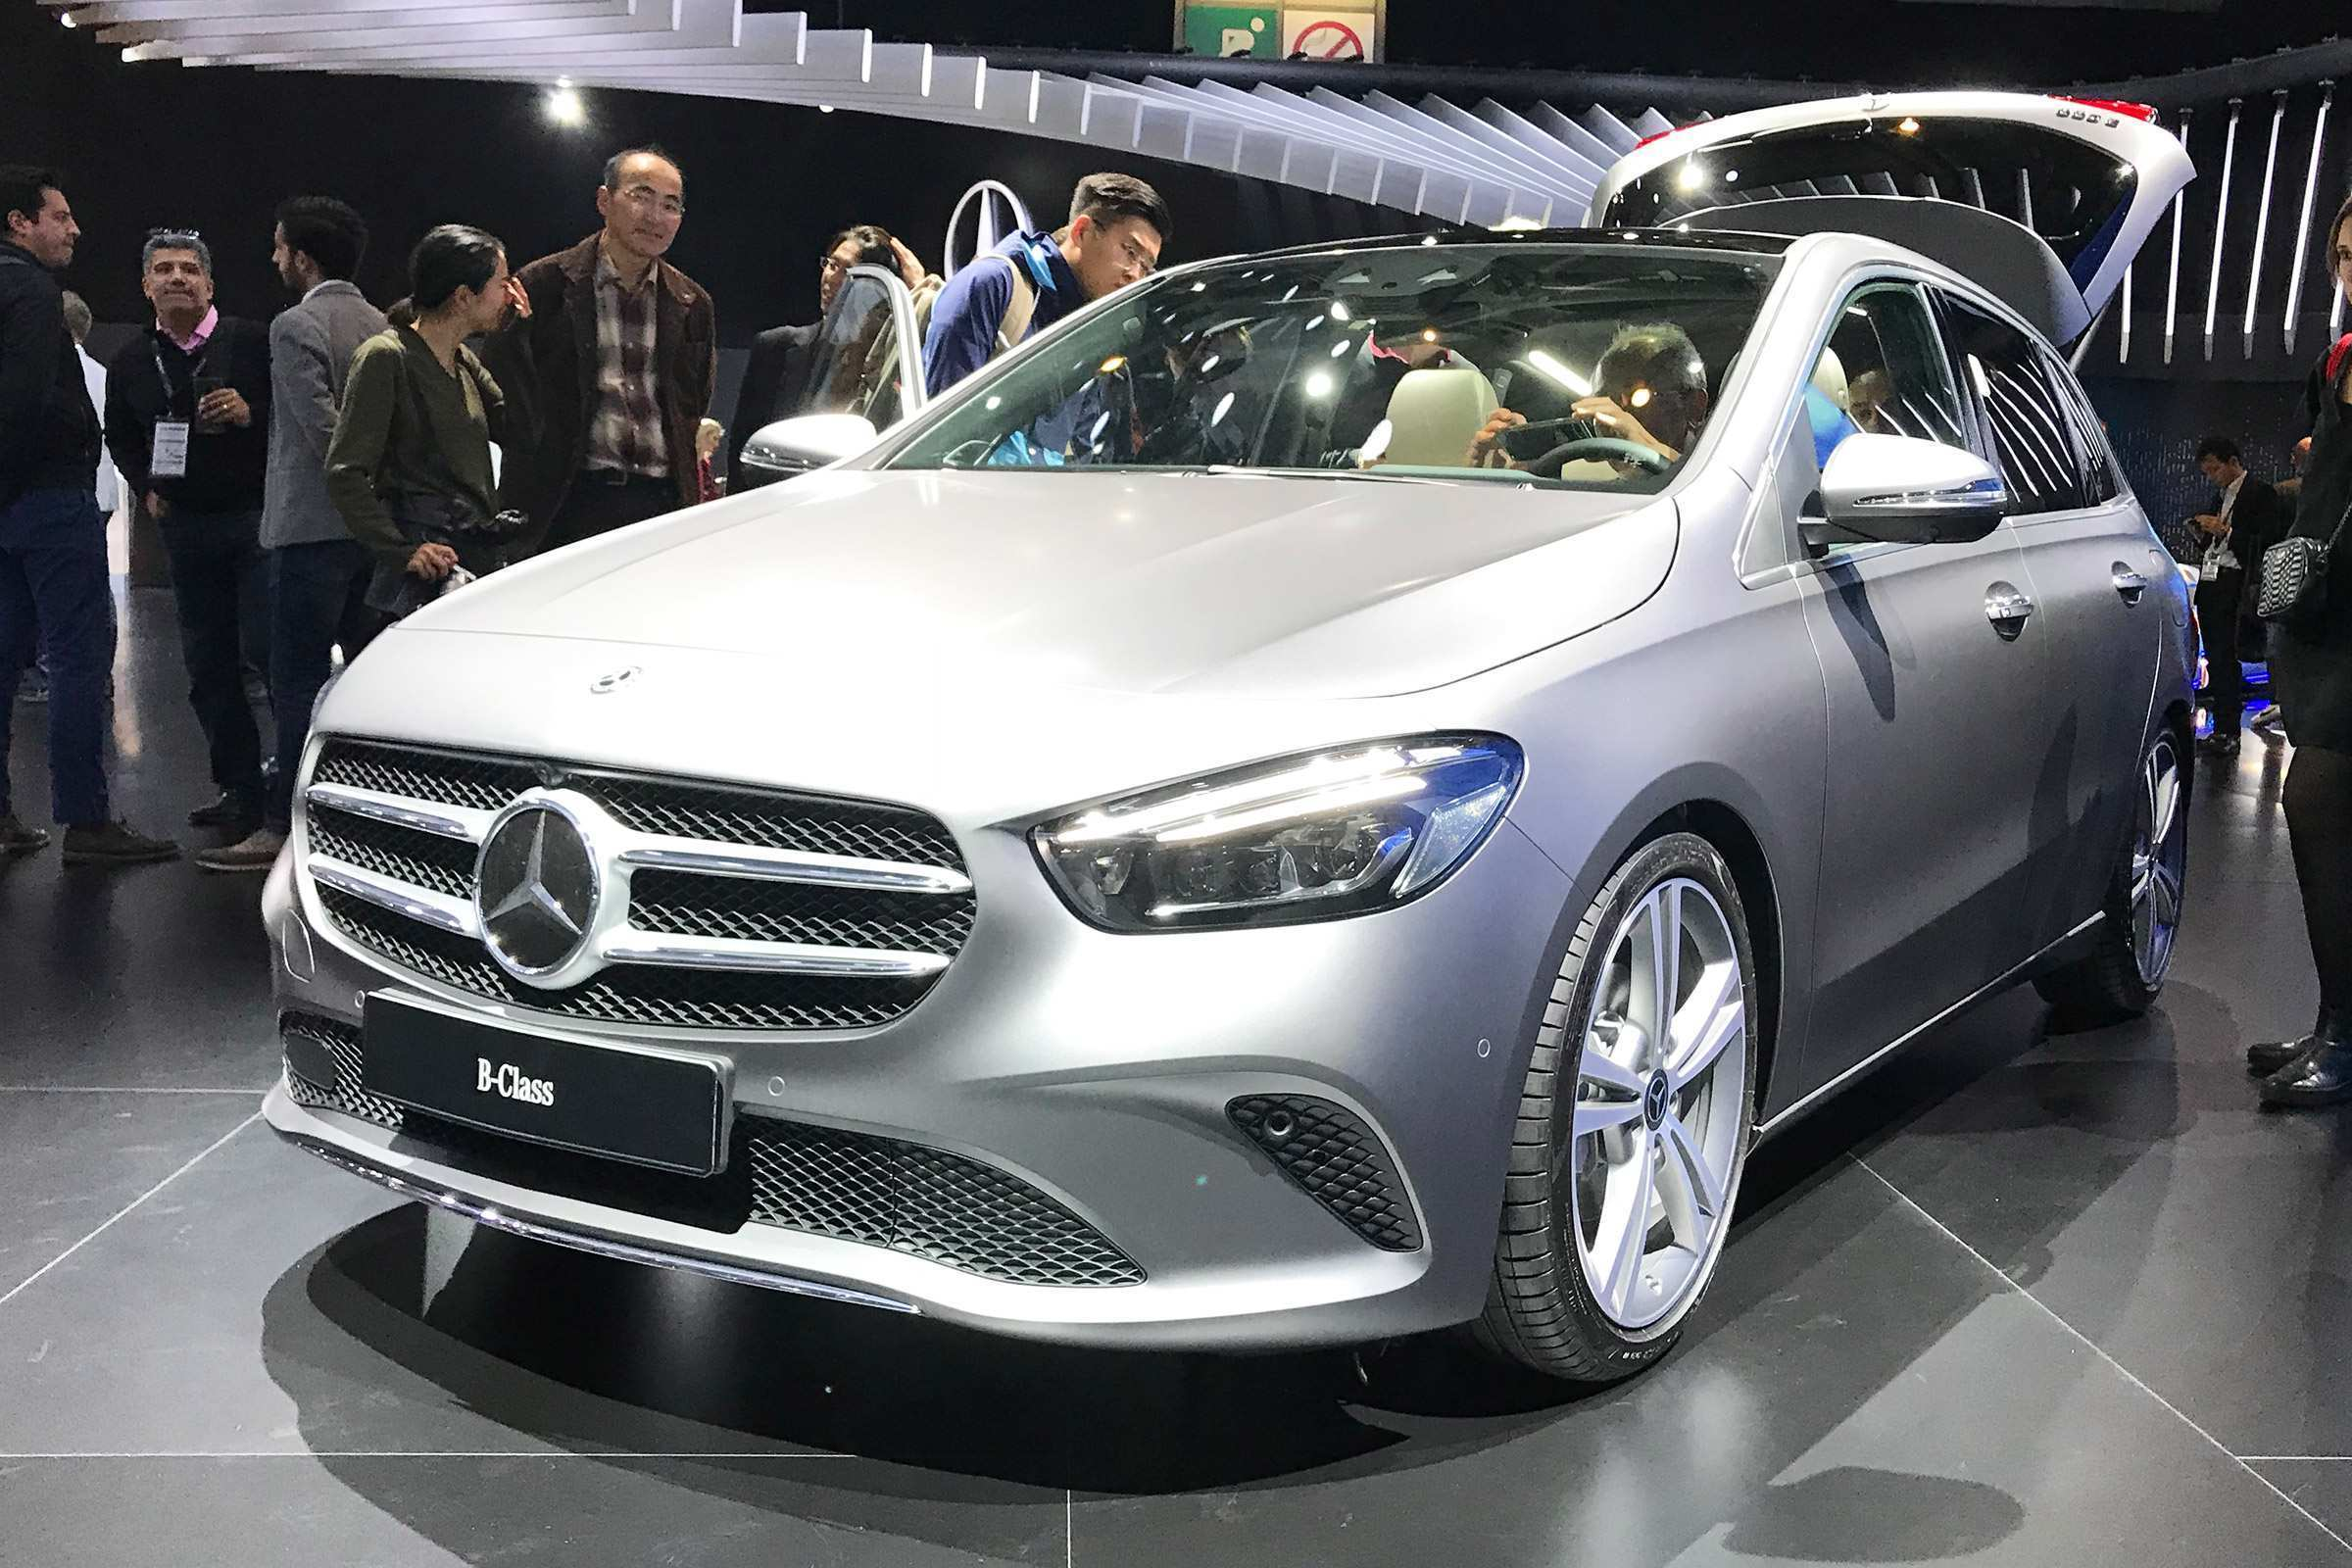 24 All New Mercedes B Klasse 2020 Performance with Mercedes B Klasse 2020